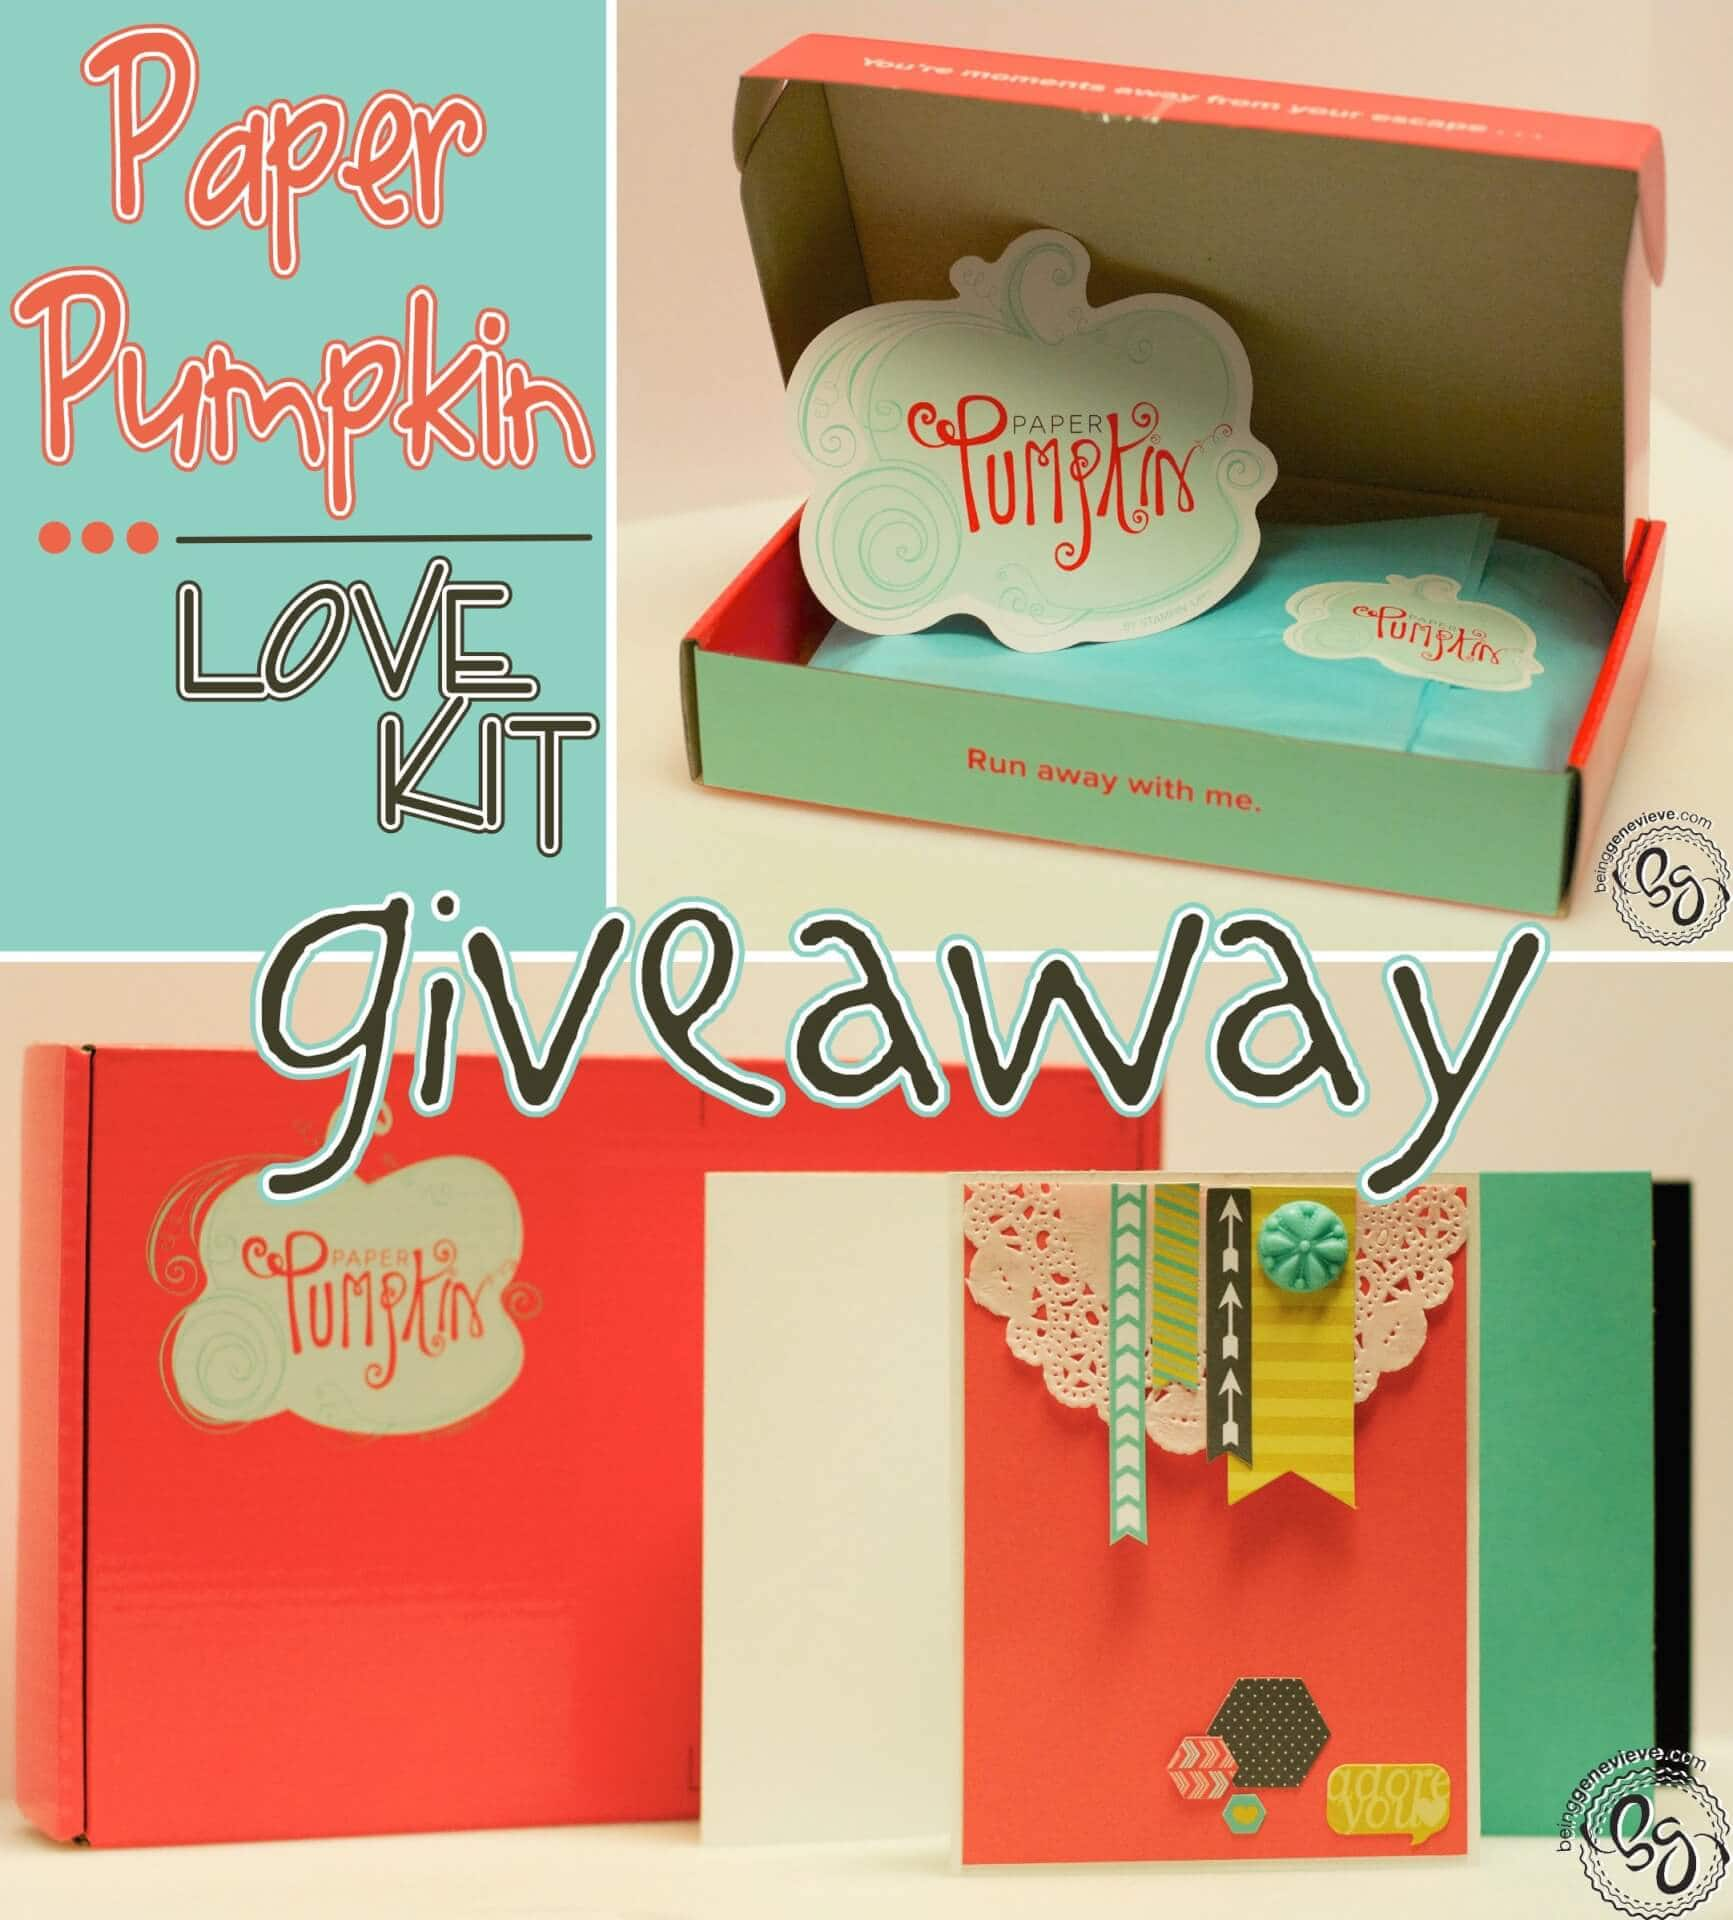 Love Paper Pumpkin